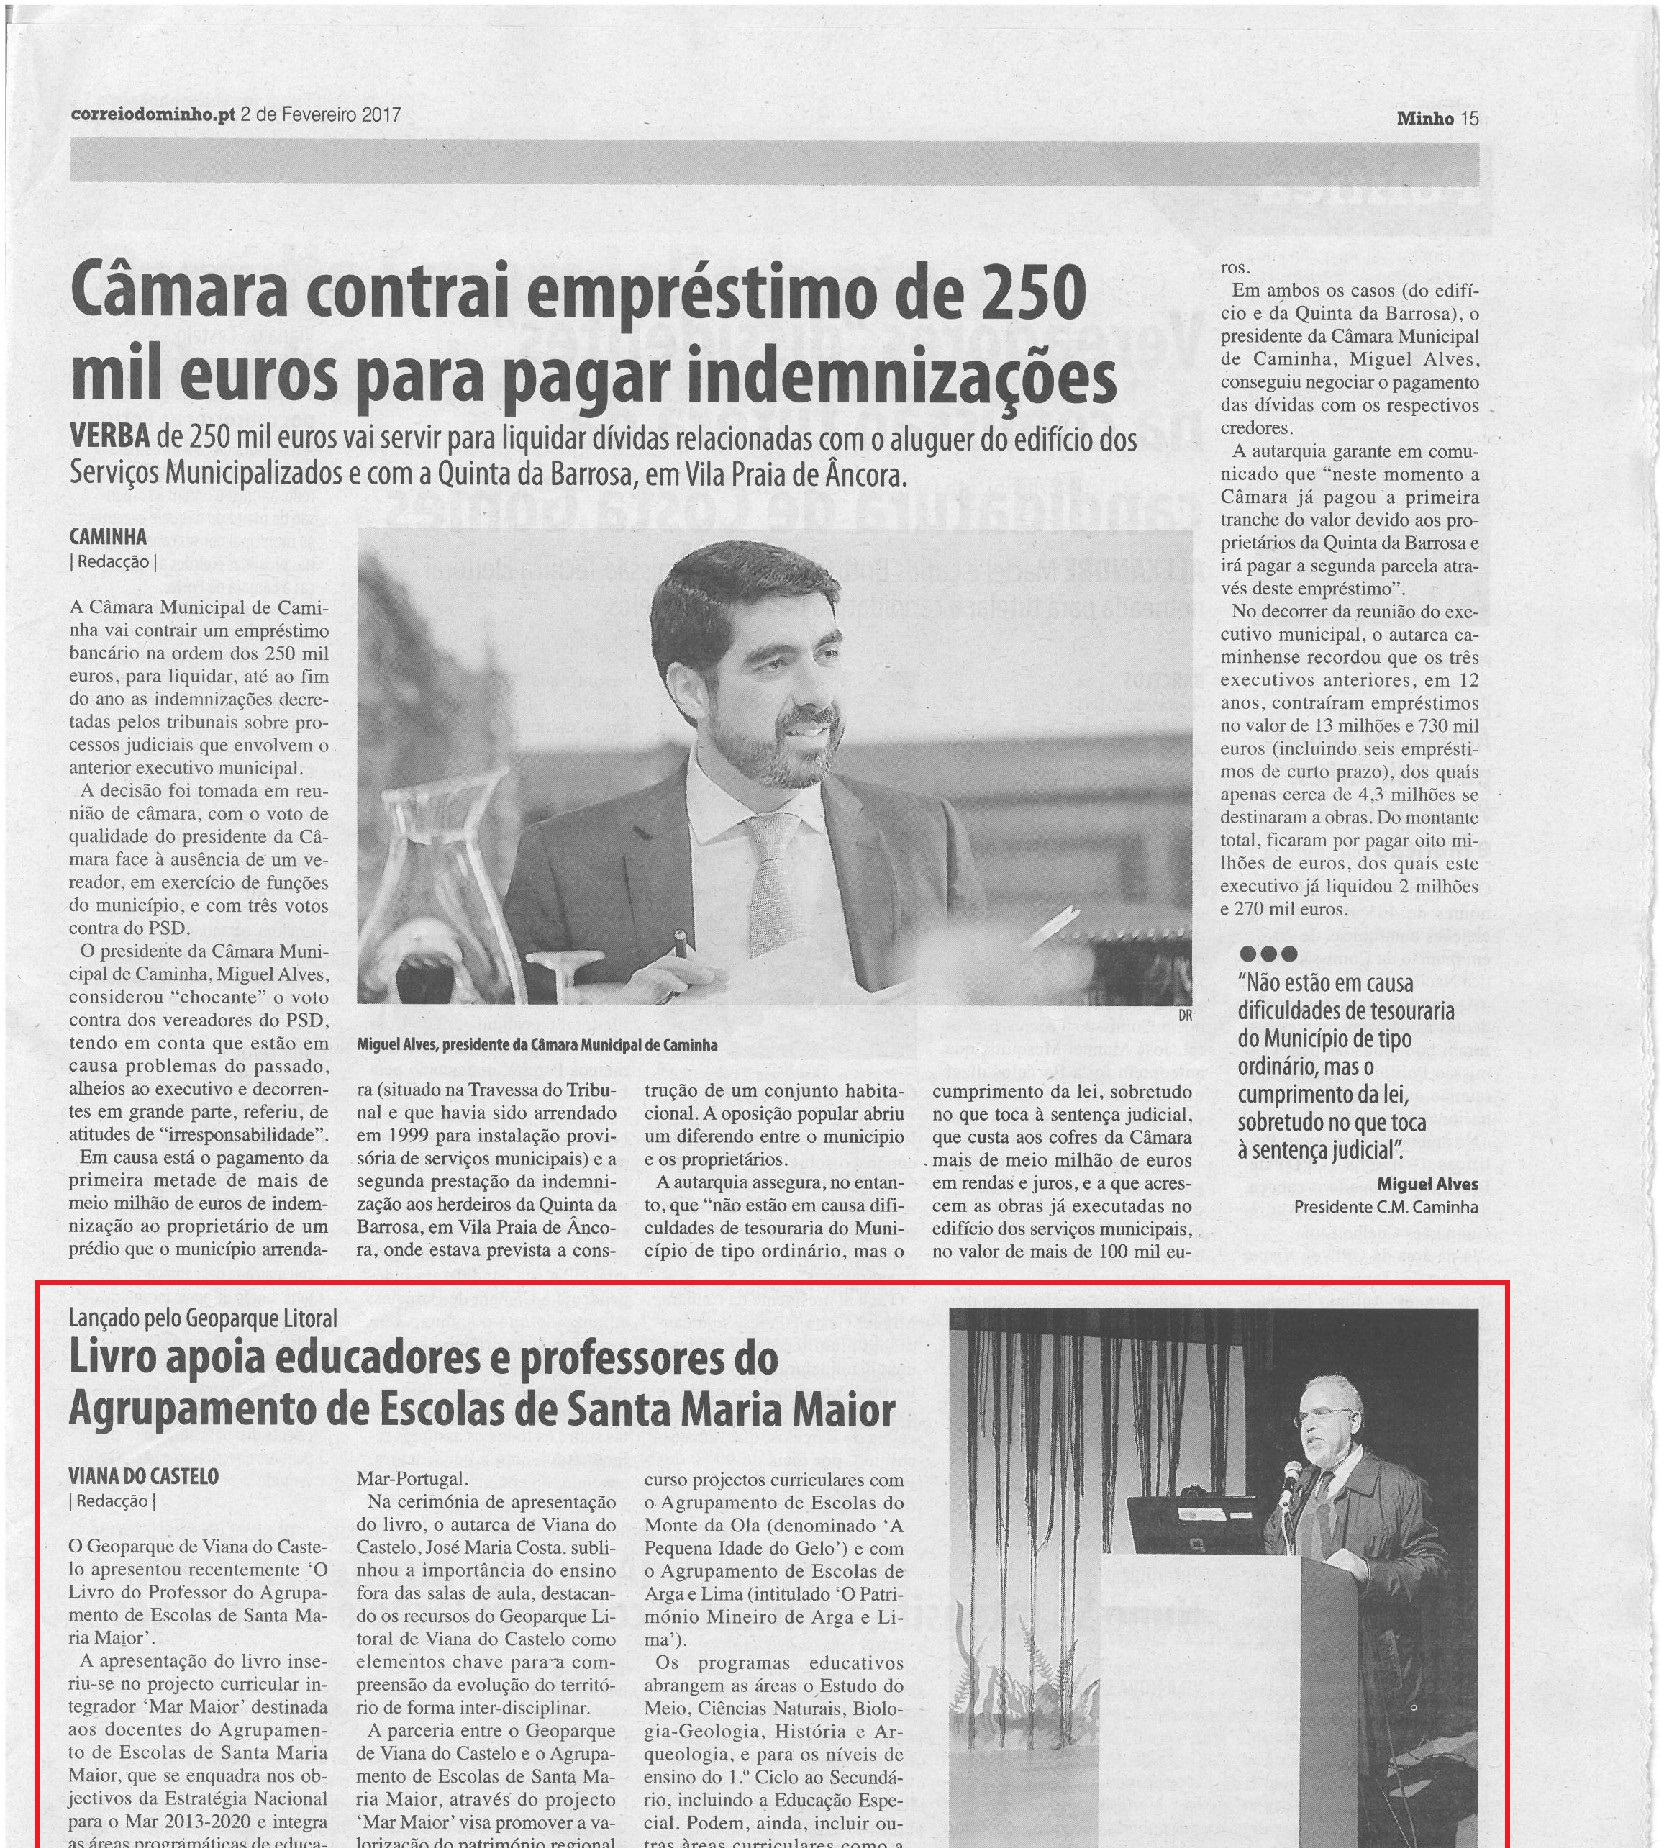 Livro apoia educadores e professores do Agrupamento de Escolas de Santa Maria Maior